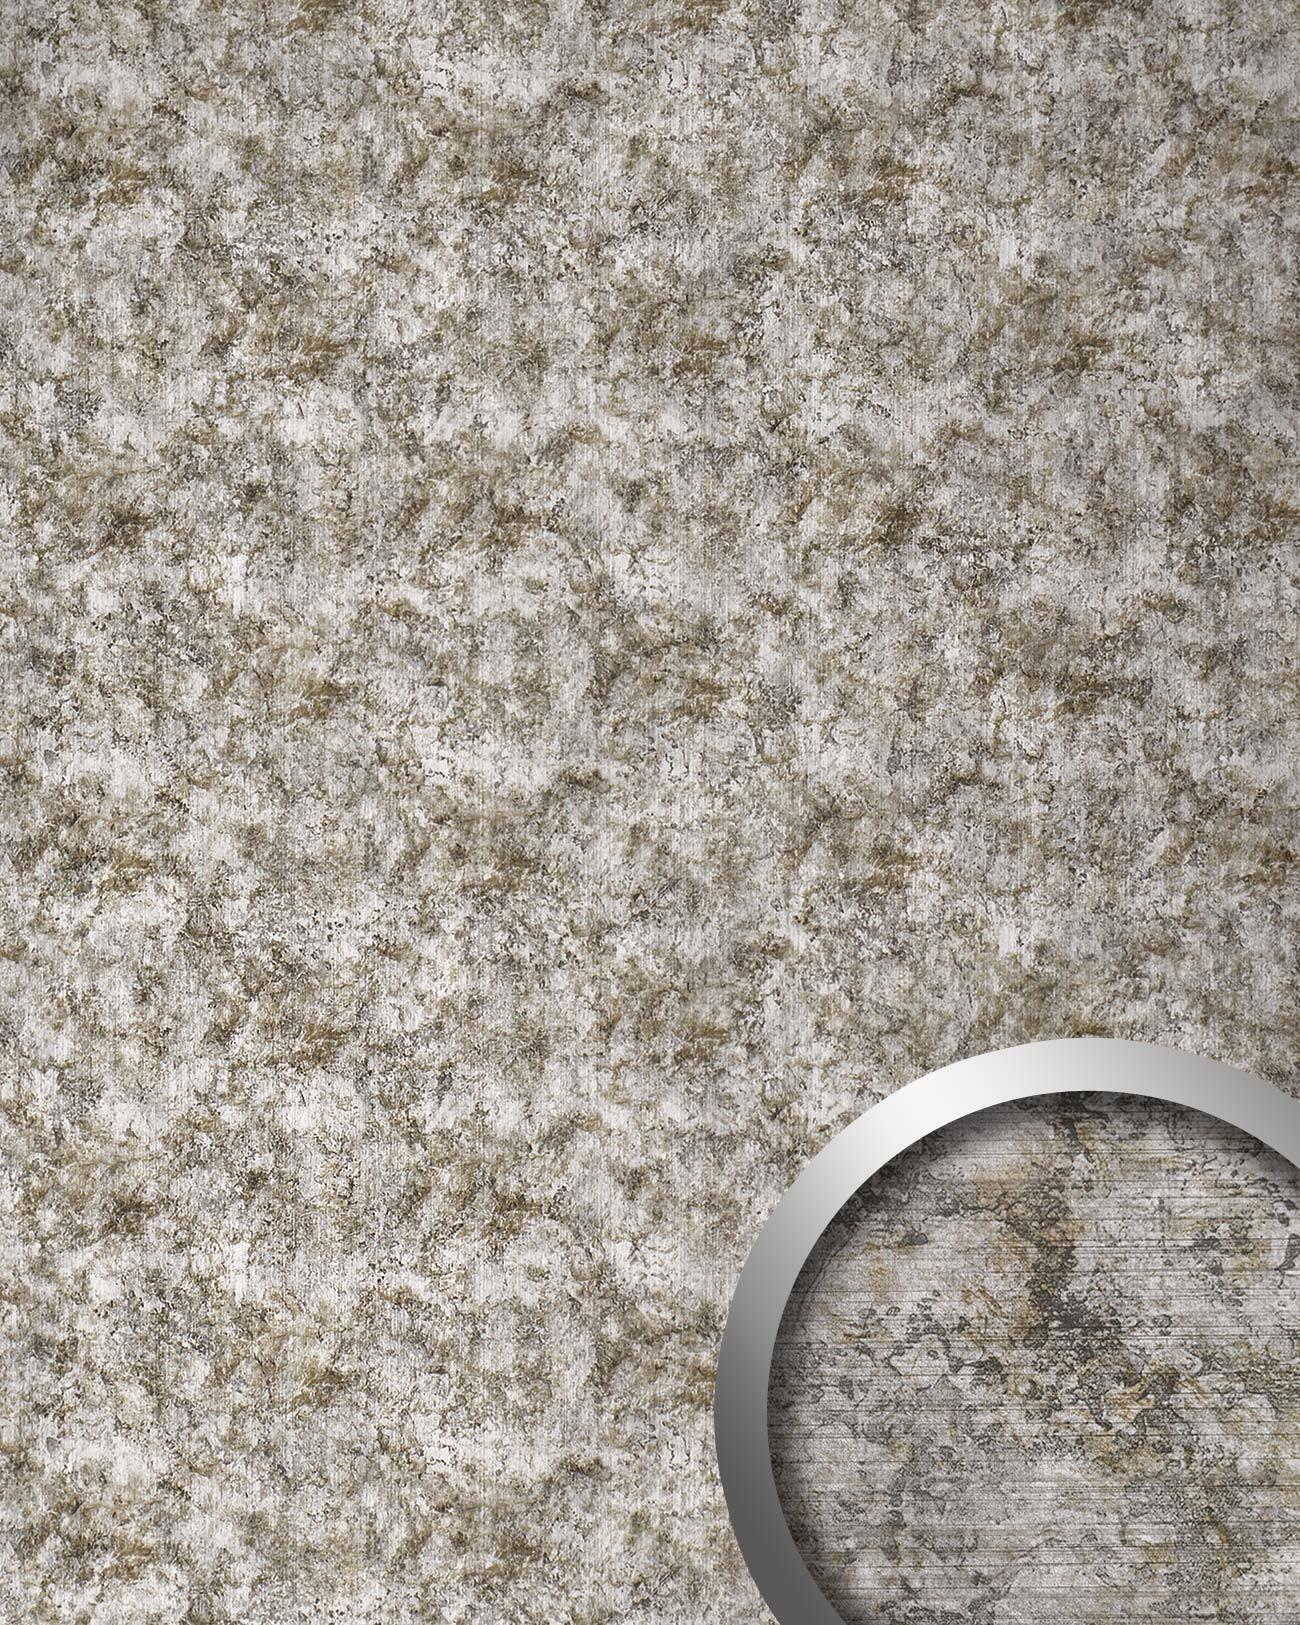 Vintage Wandverkleidung: Wandverkleidung 17275 DECO VINTAGE Metall-Rost-Optik Grau